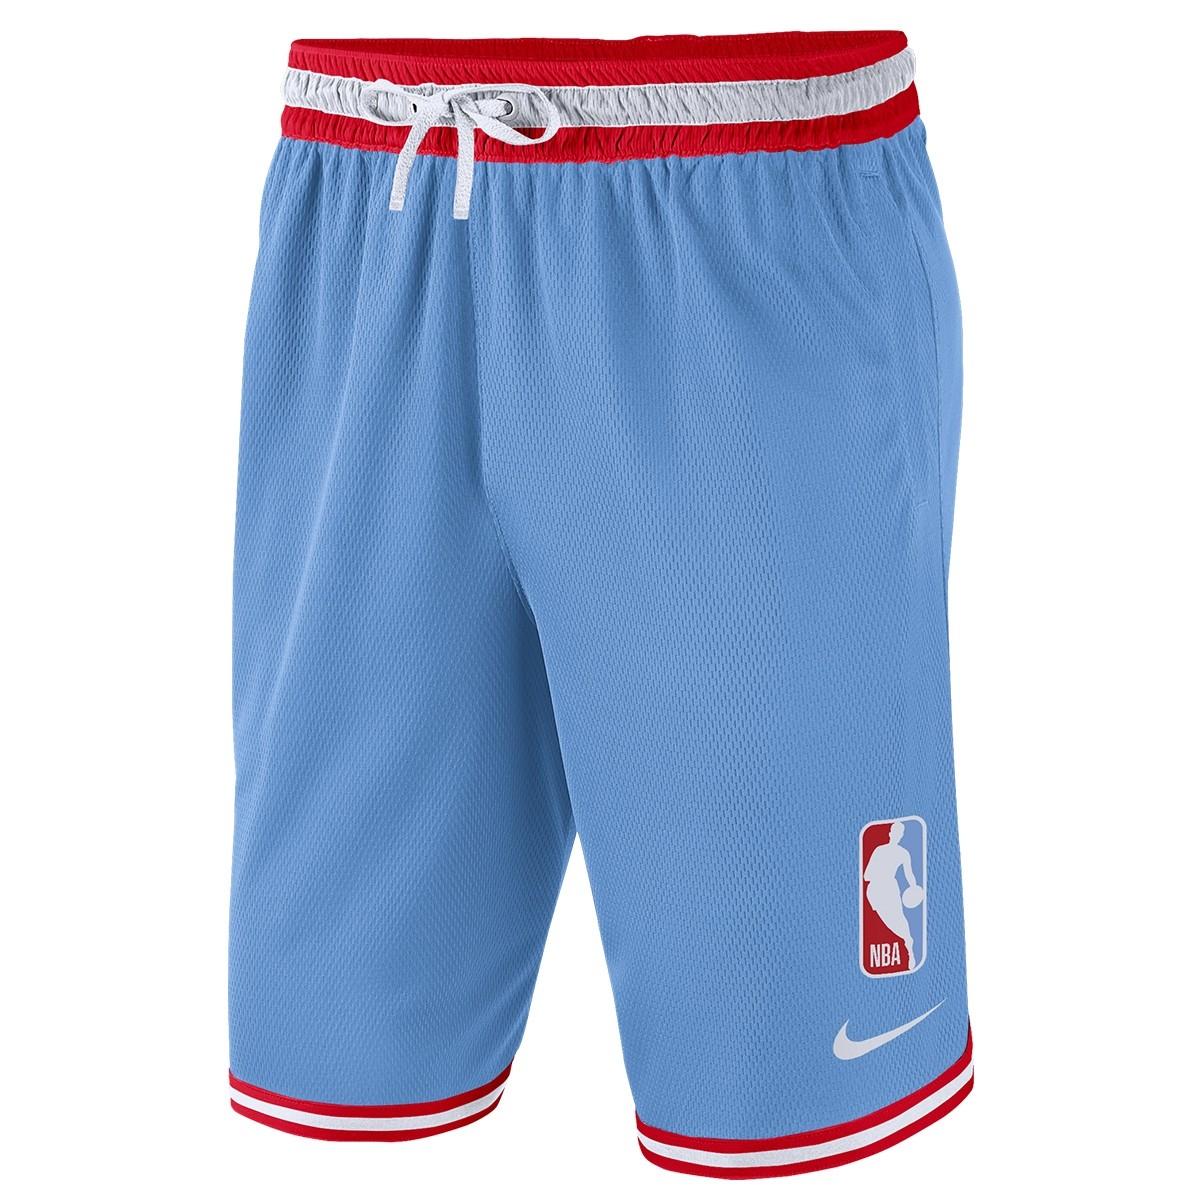 Nike NBA Short Team 31 DNA 'Blue'